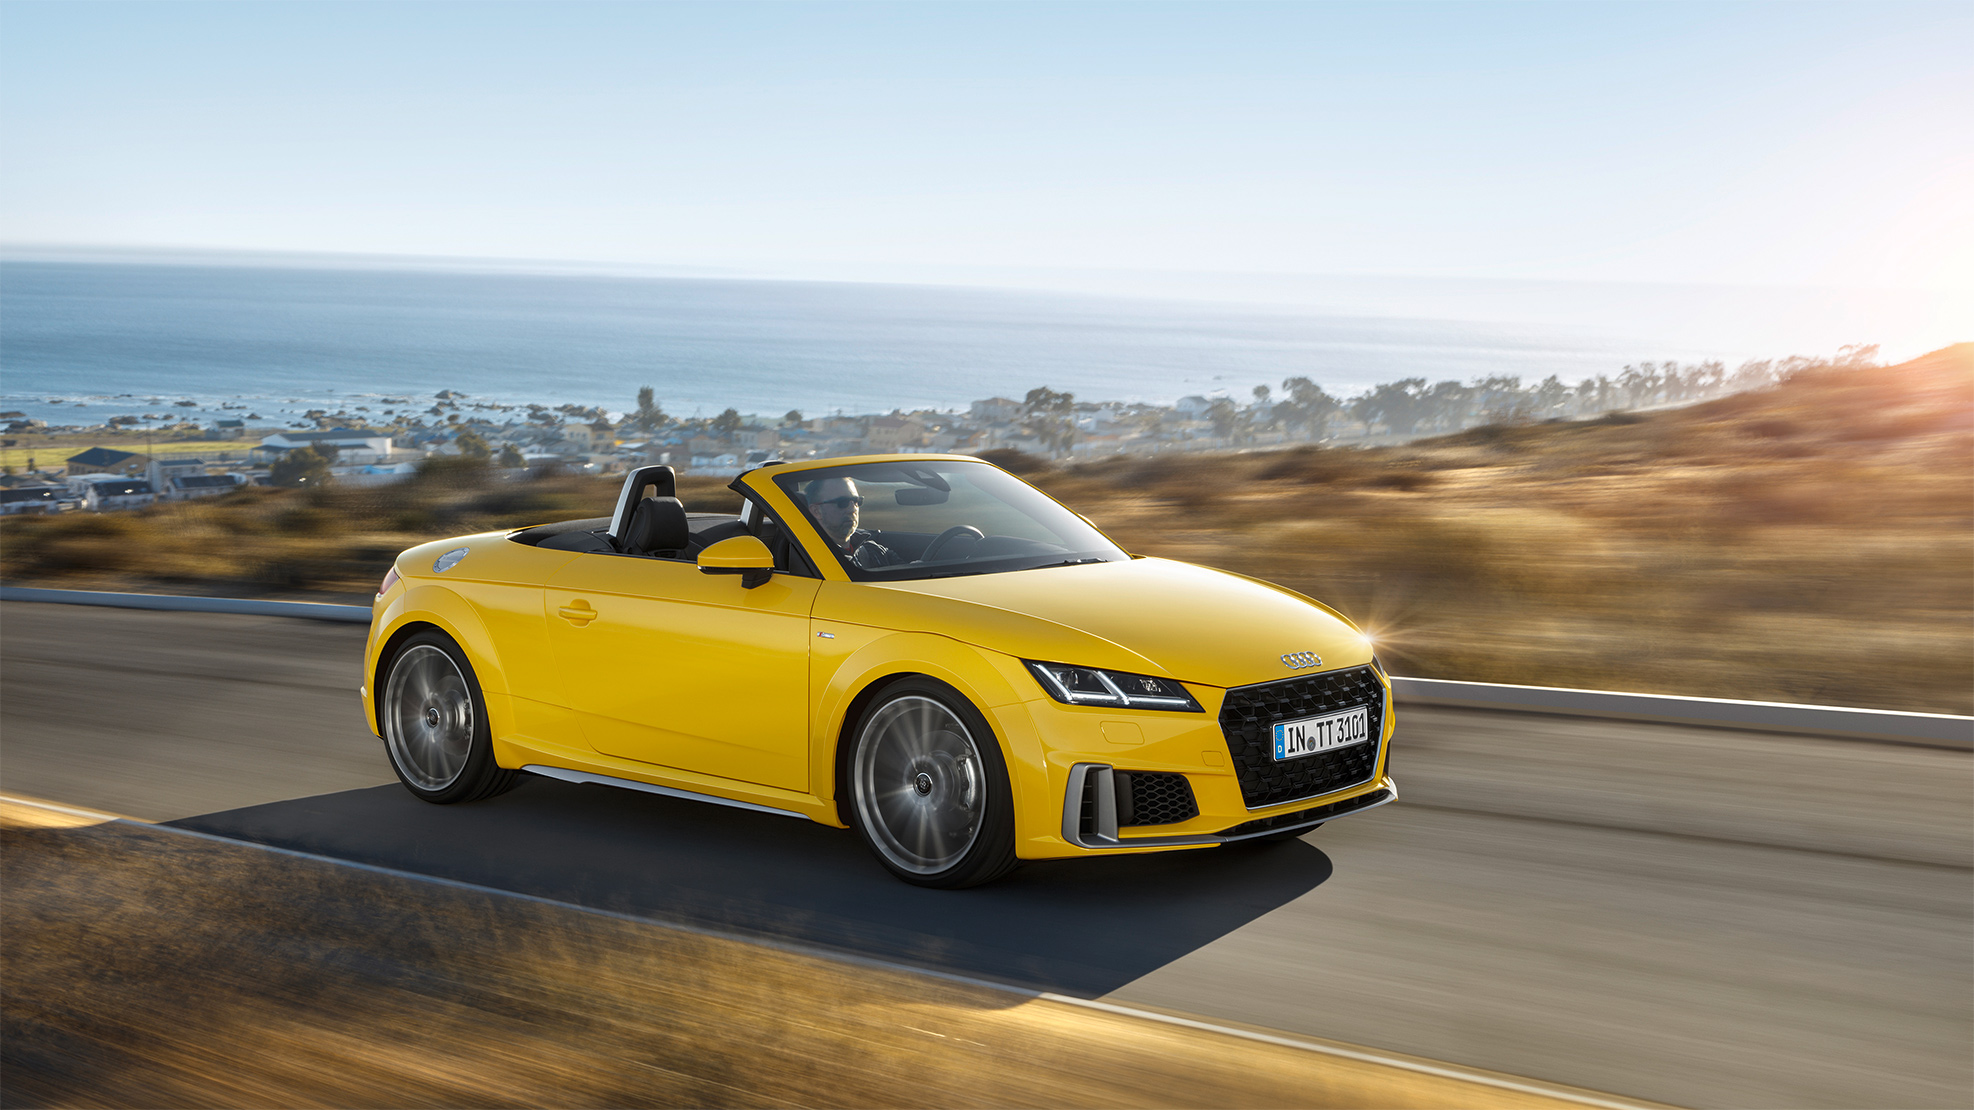 TrackWorthy - 2019 Audi TT Roadster S Line (6)